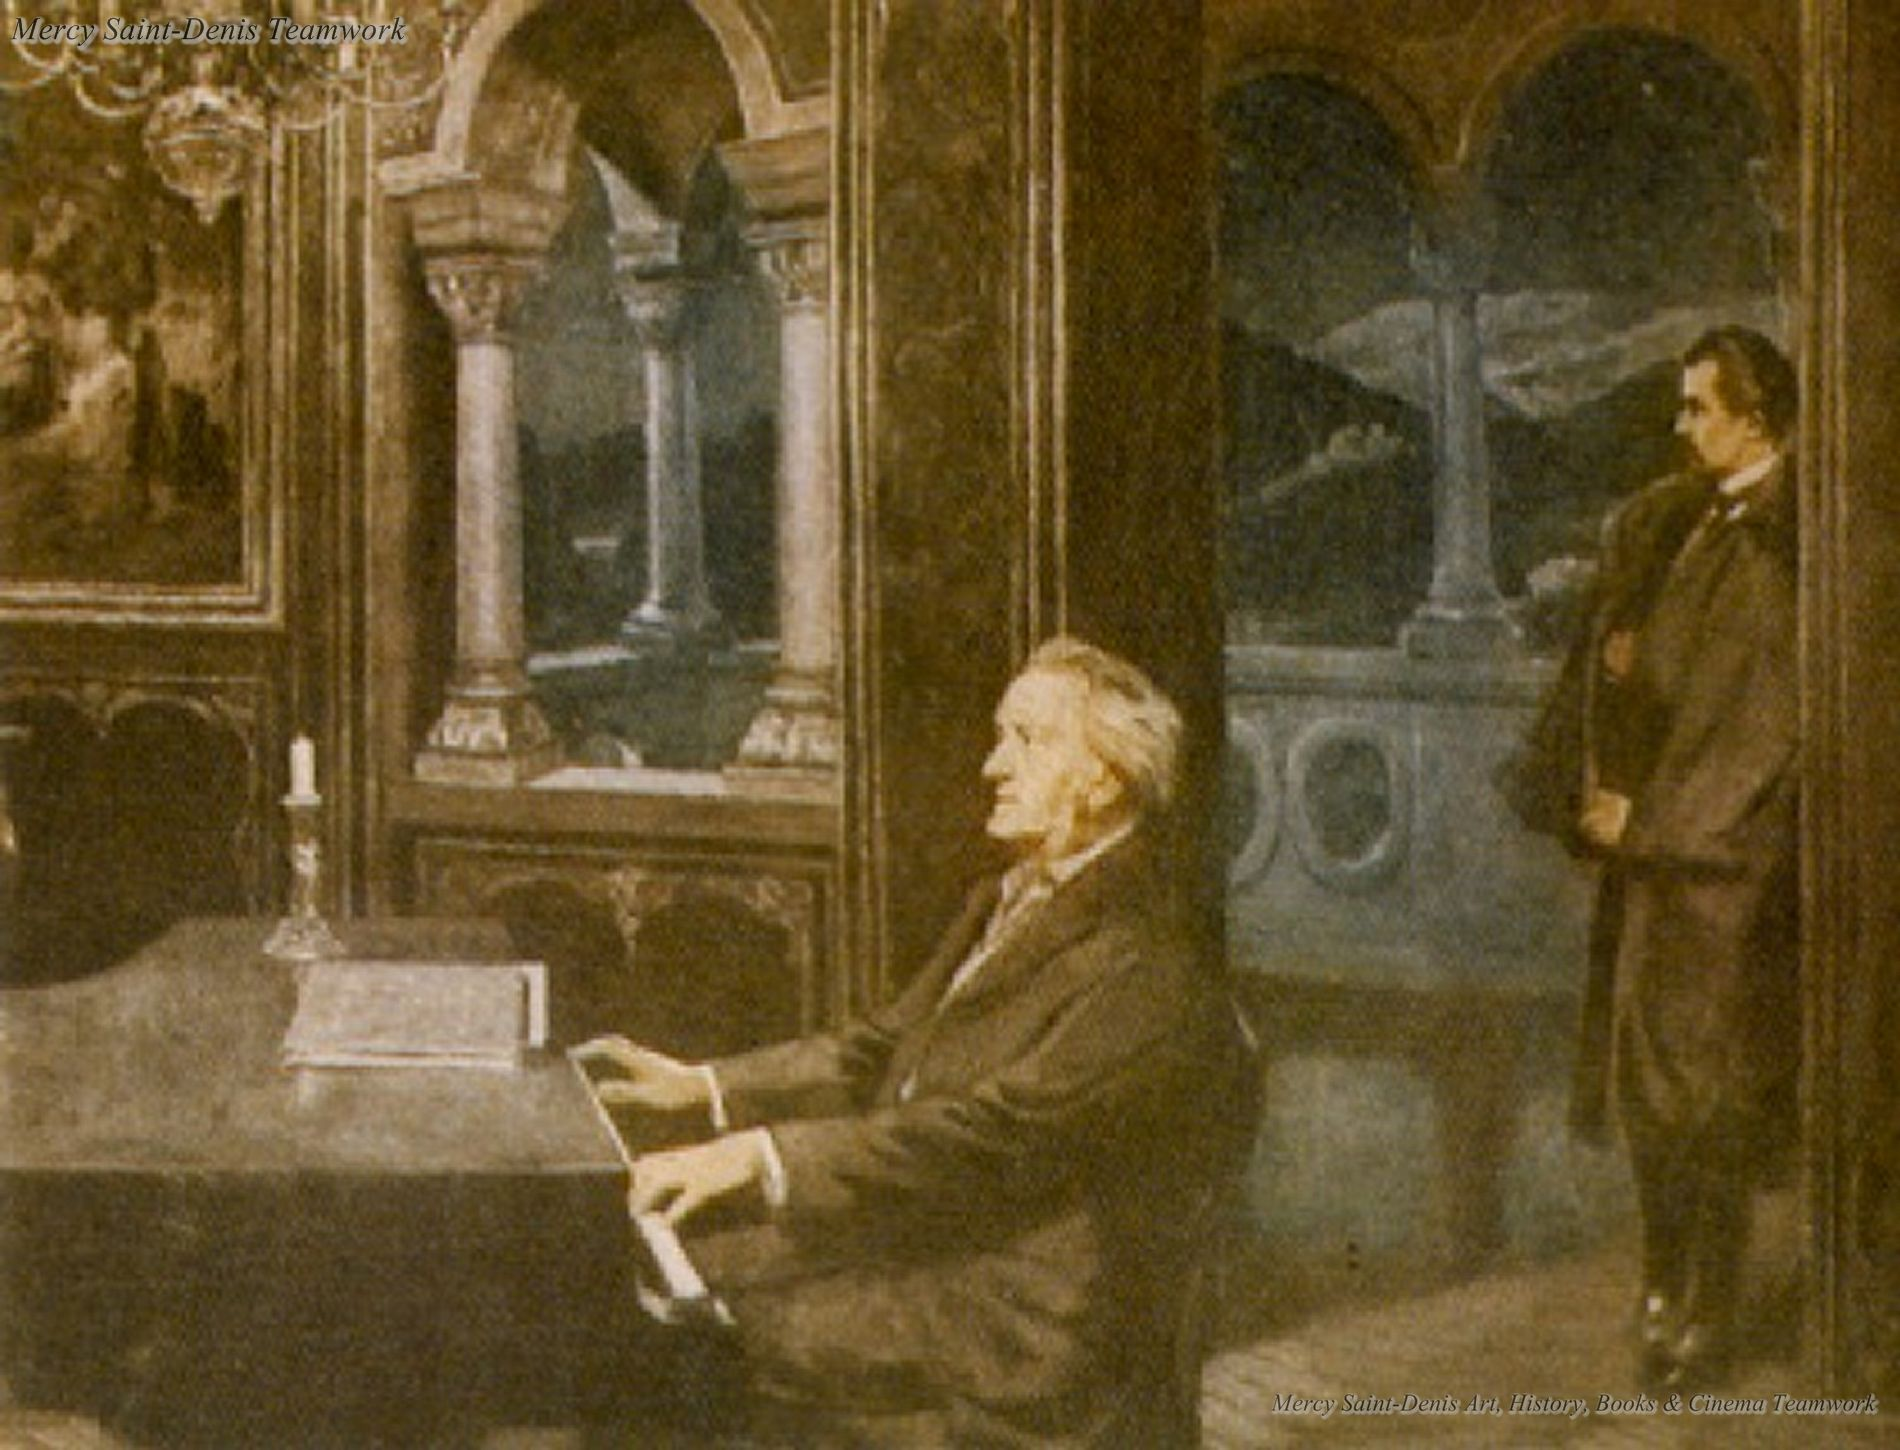 Ludwig II and Richard Wagner - Painting by Kurt von Roszinsky.